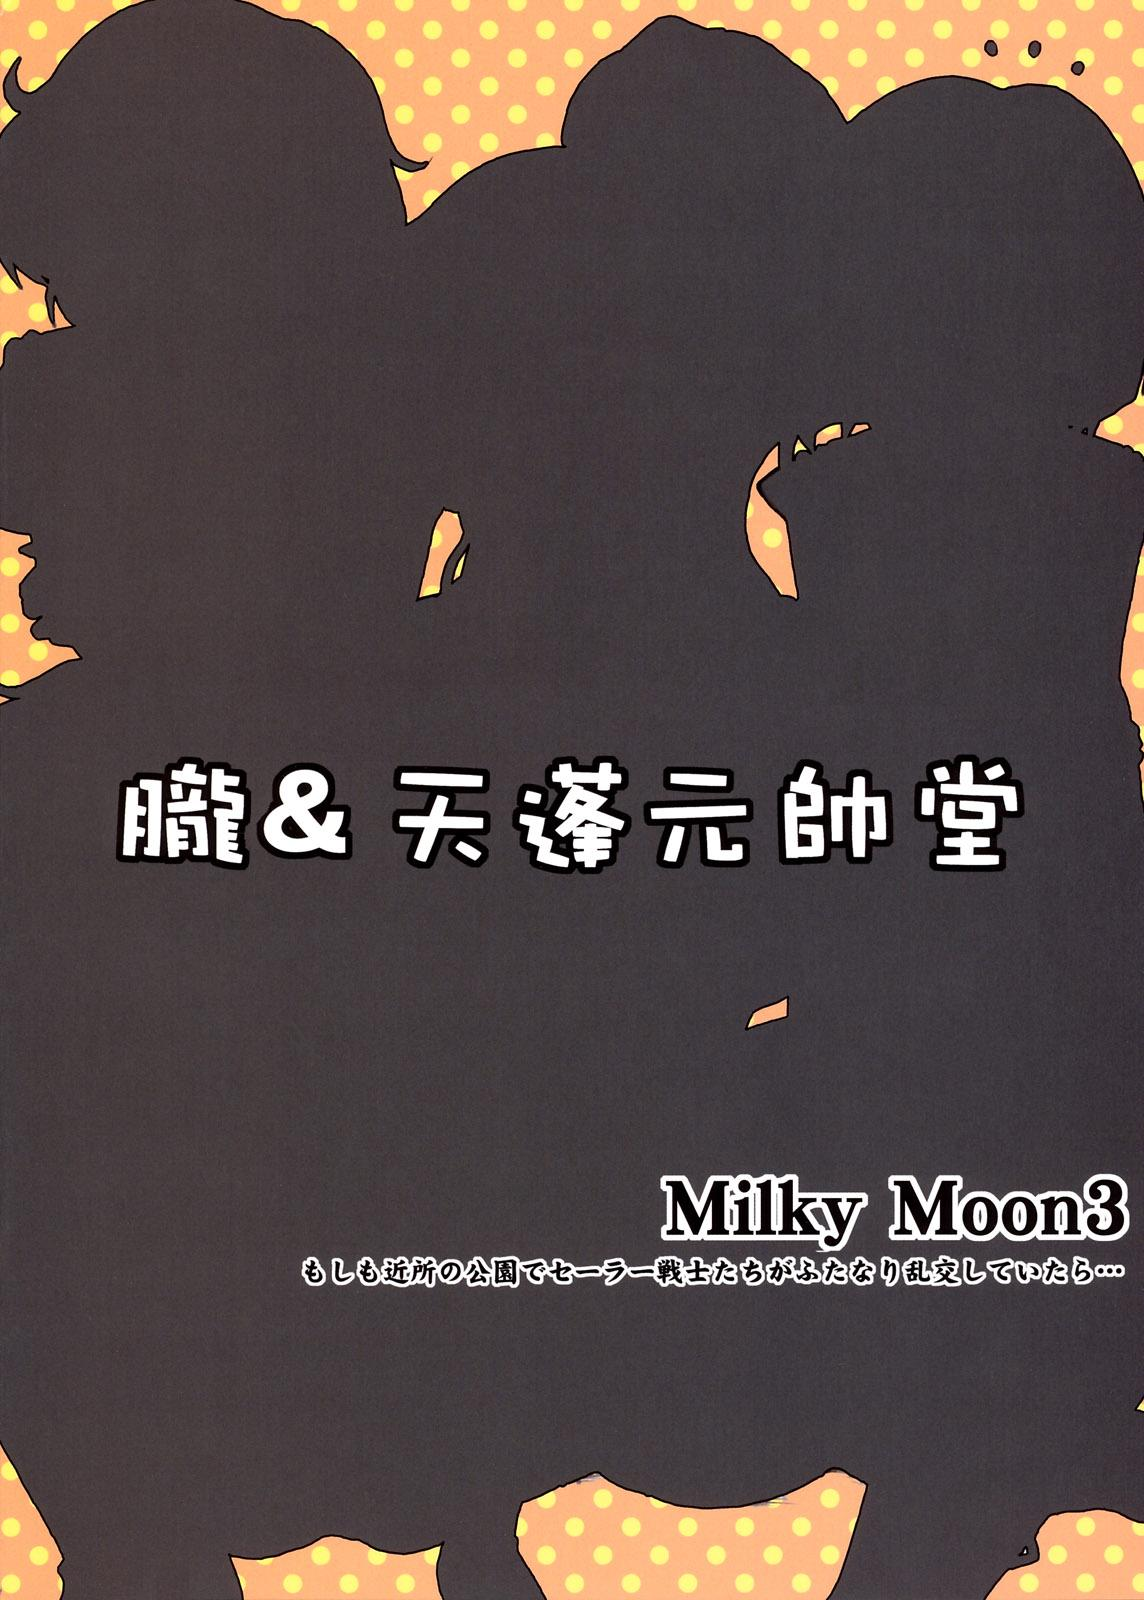 Milky Moon 3 + Omake 17